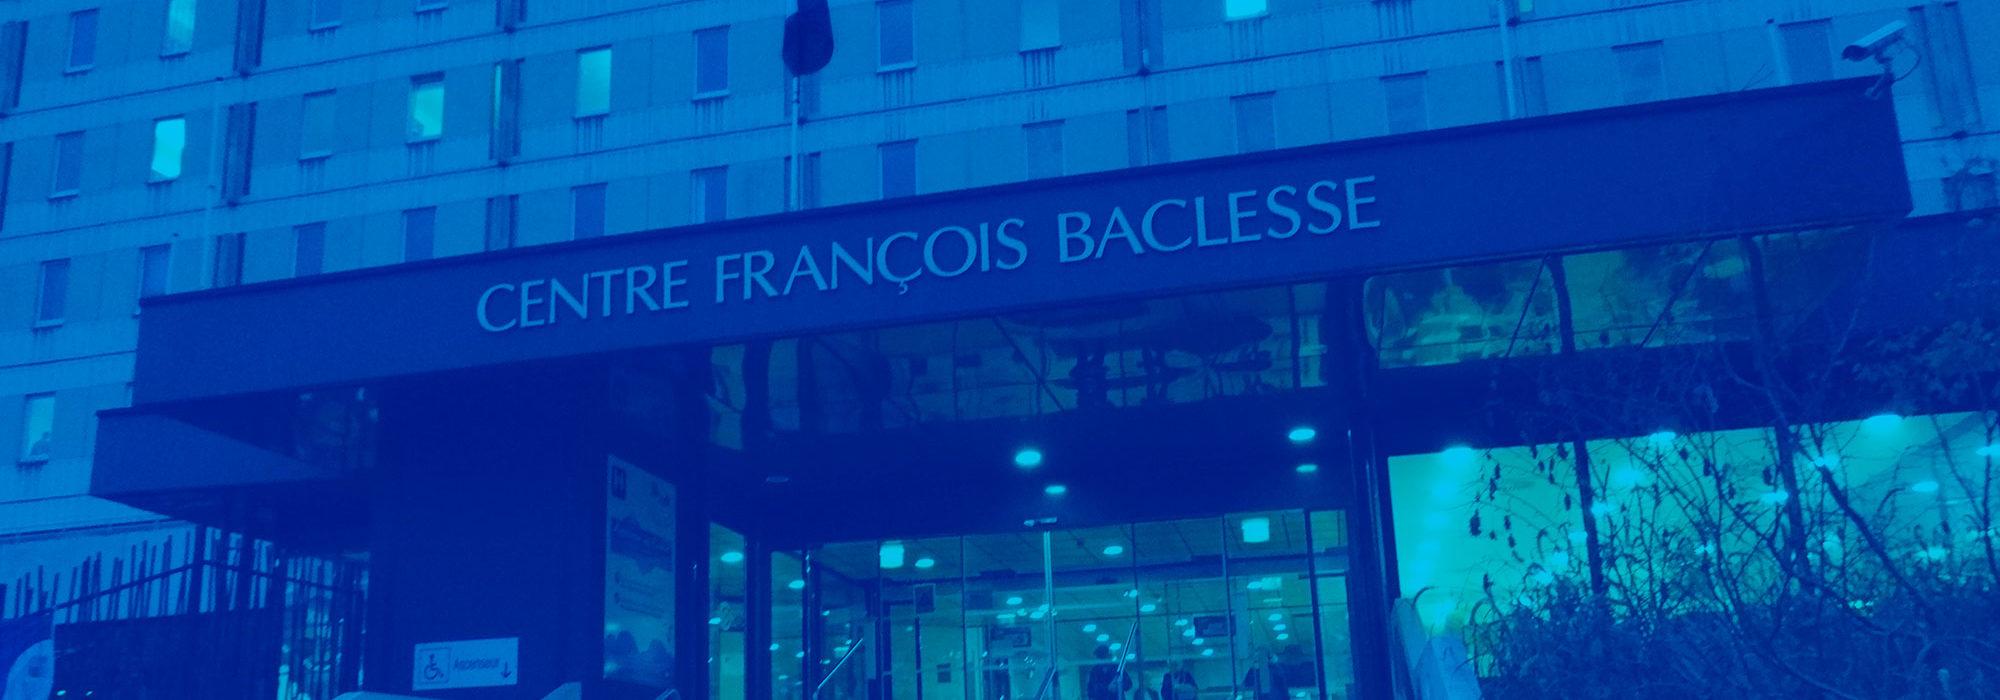 fond-centre-francois-baclesse-1